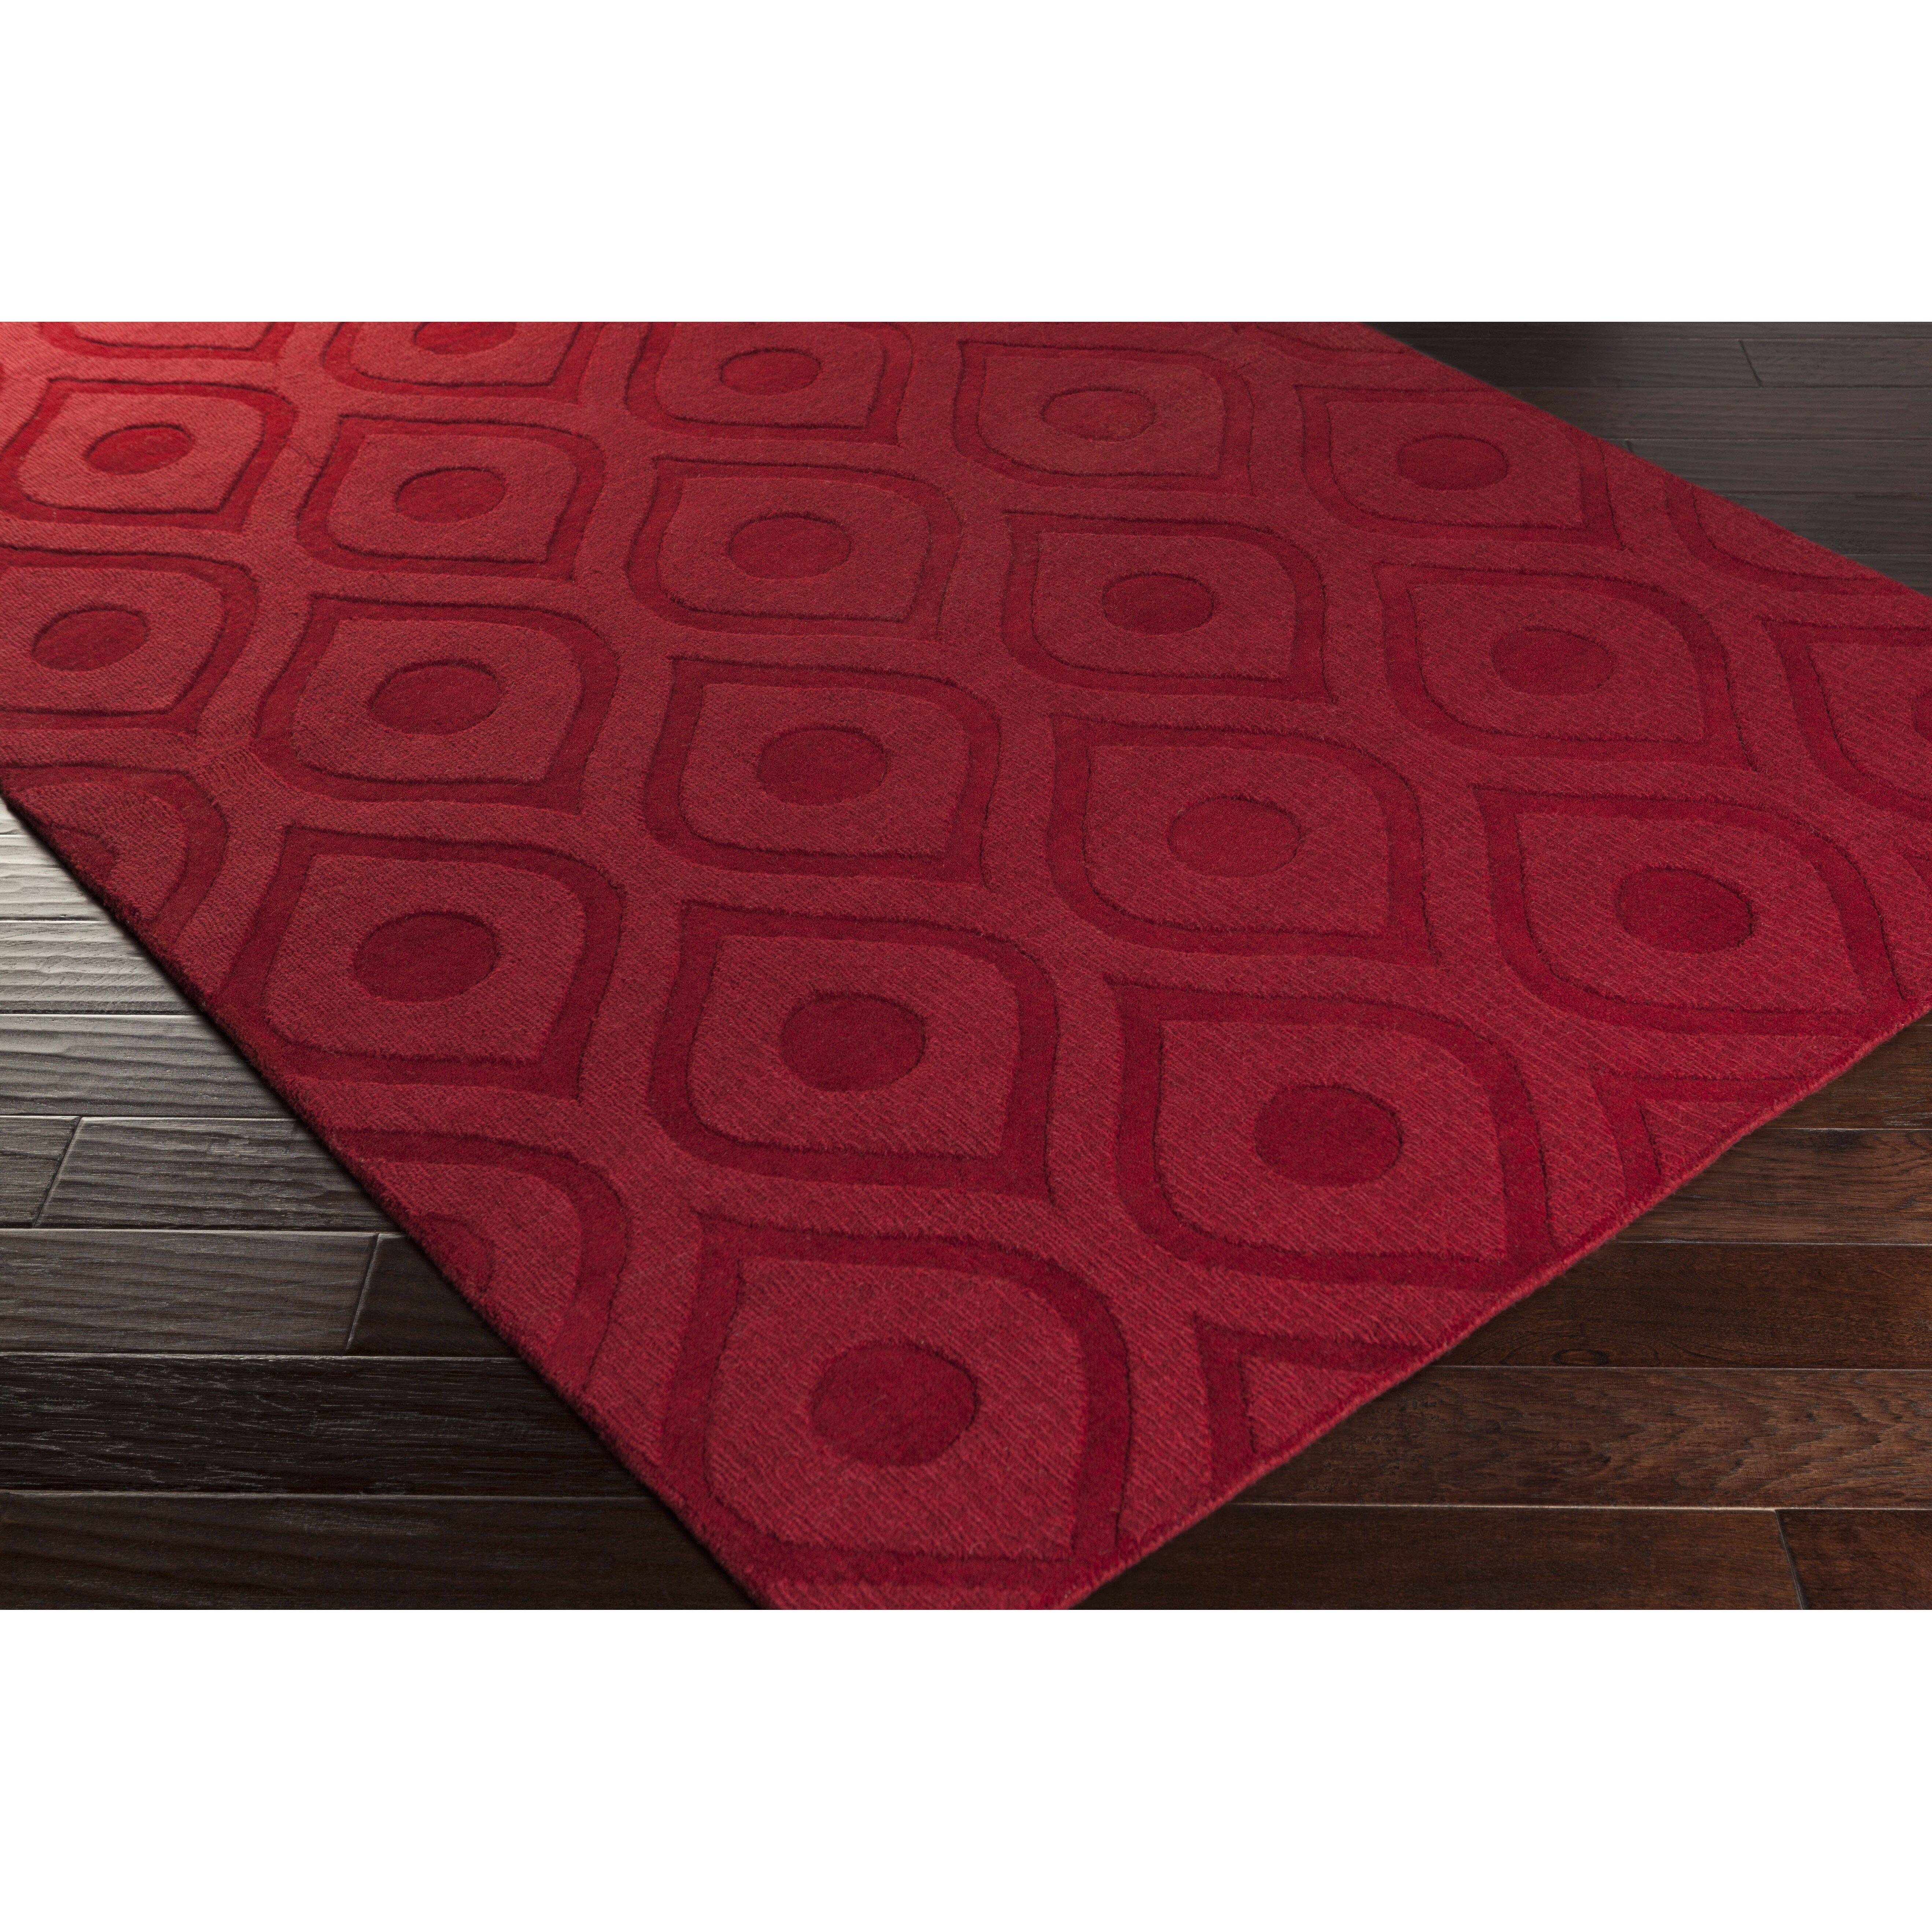 Artistic Weavers Central Park Red Geometric Zara Area Rug